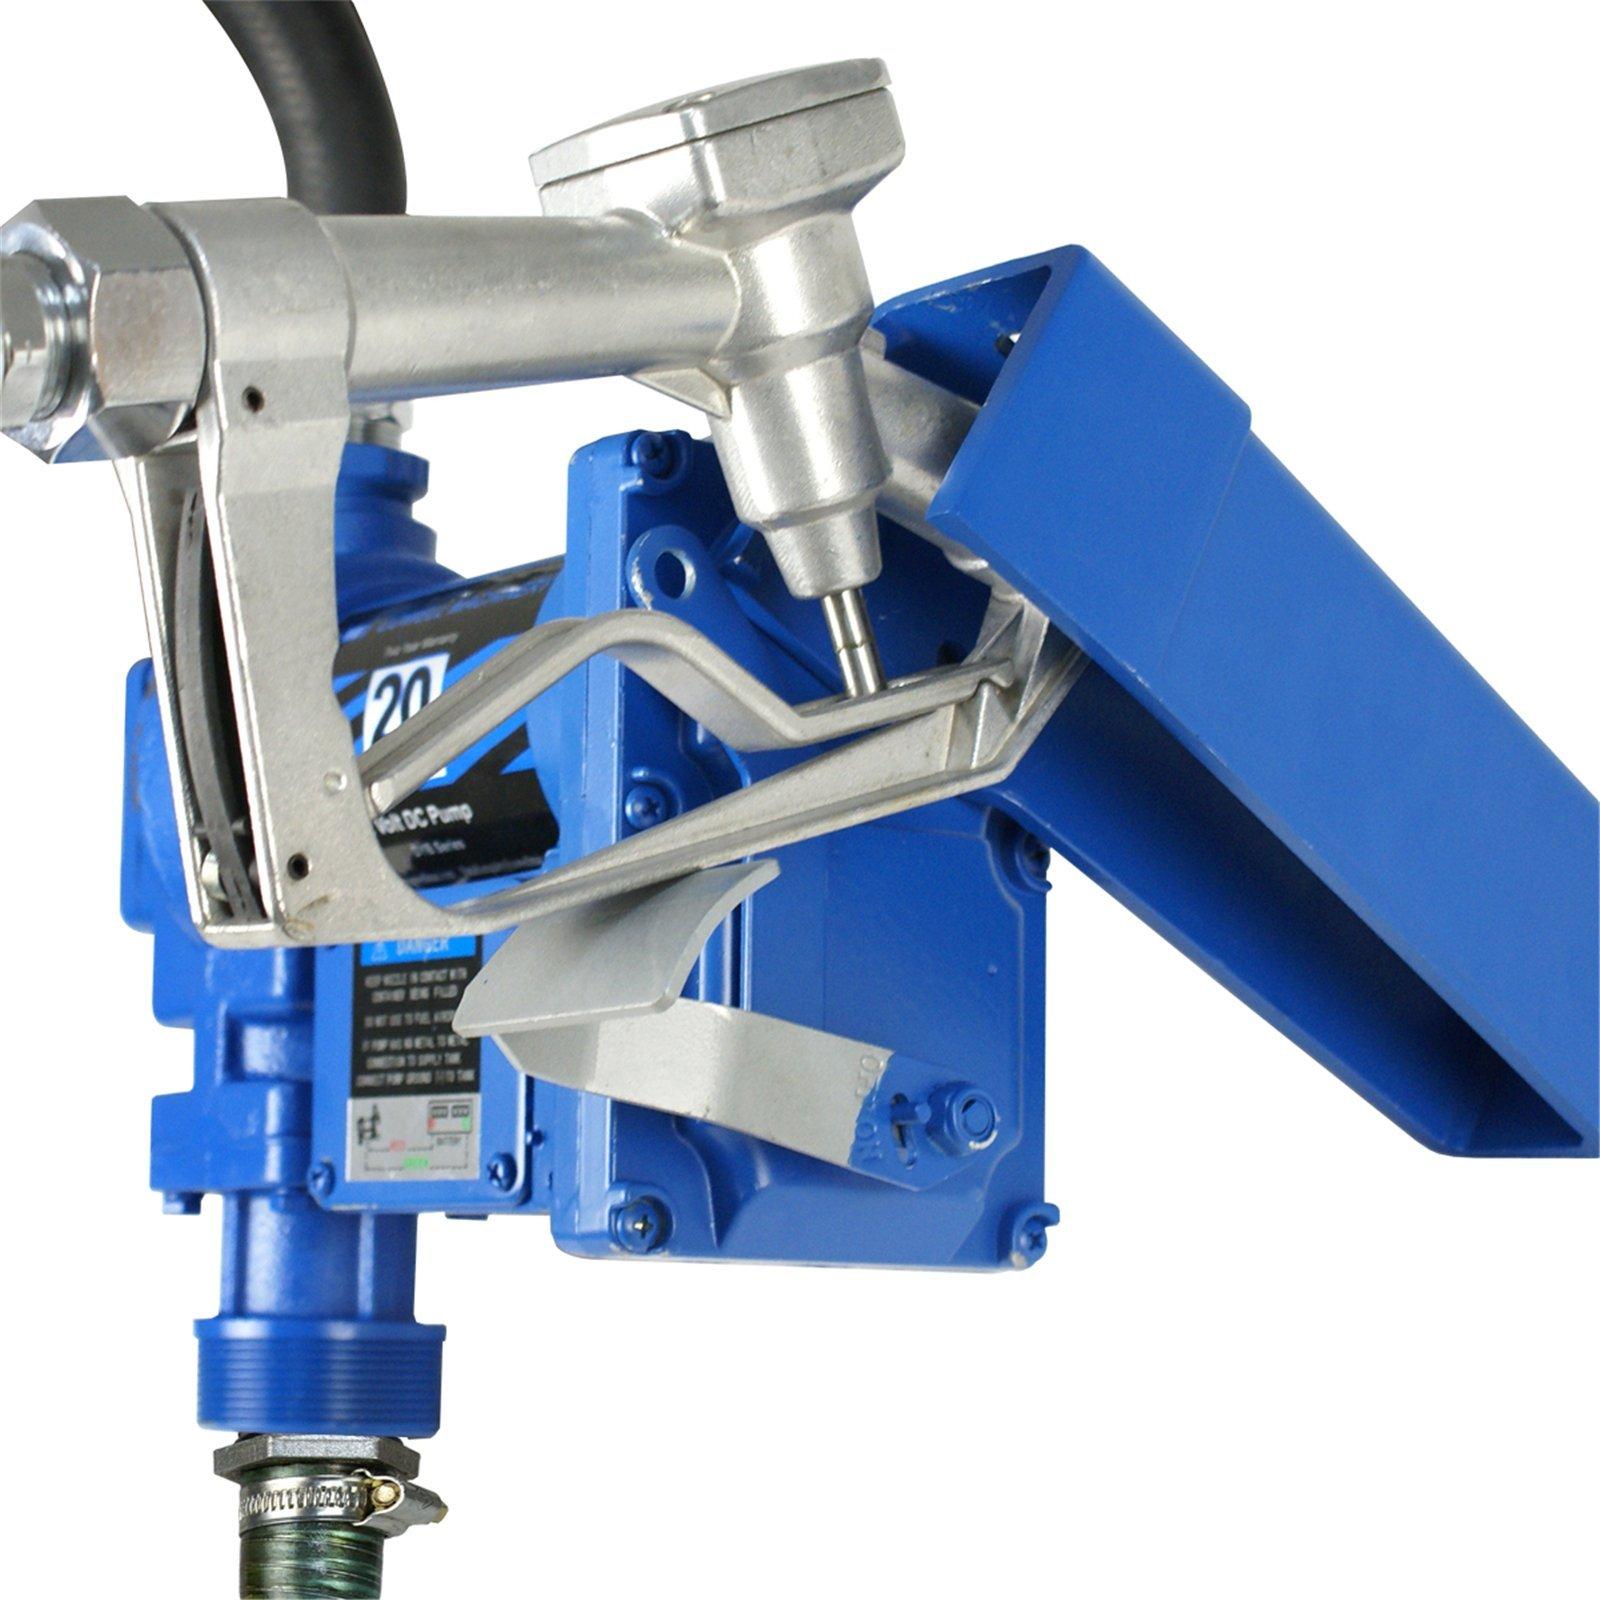 F2C 12 Volt 20GPM Electric Diesel Kerosene Gasoline Fuel Transfer Pump Fillrite Manual Nozzle Hose Kit … Blue by F2C (Image #6)